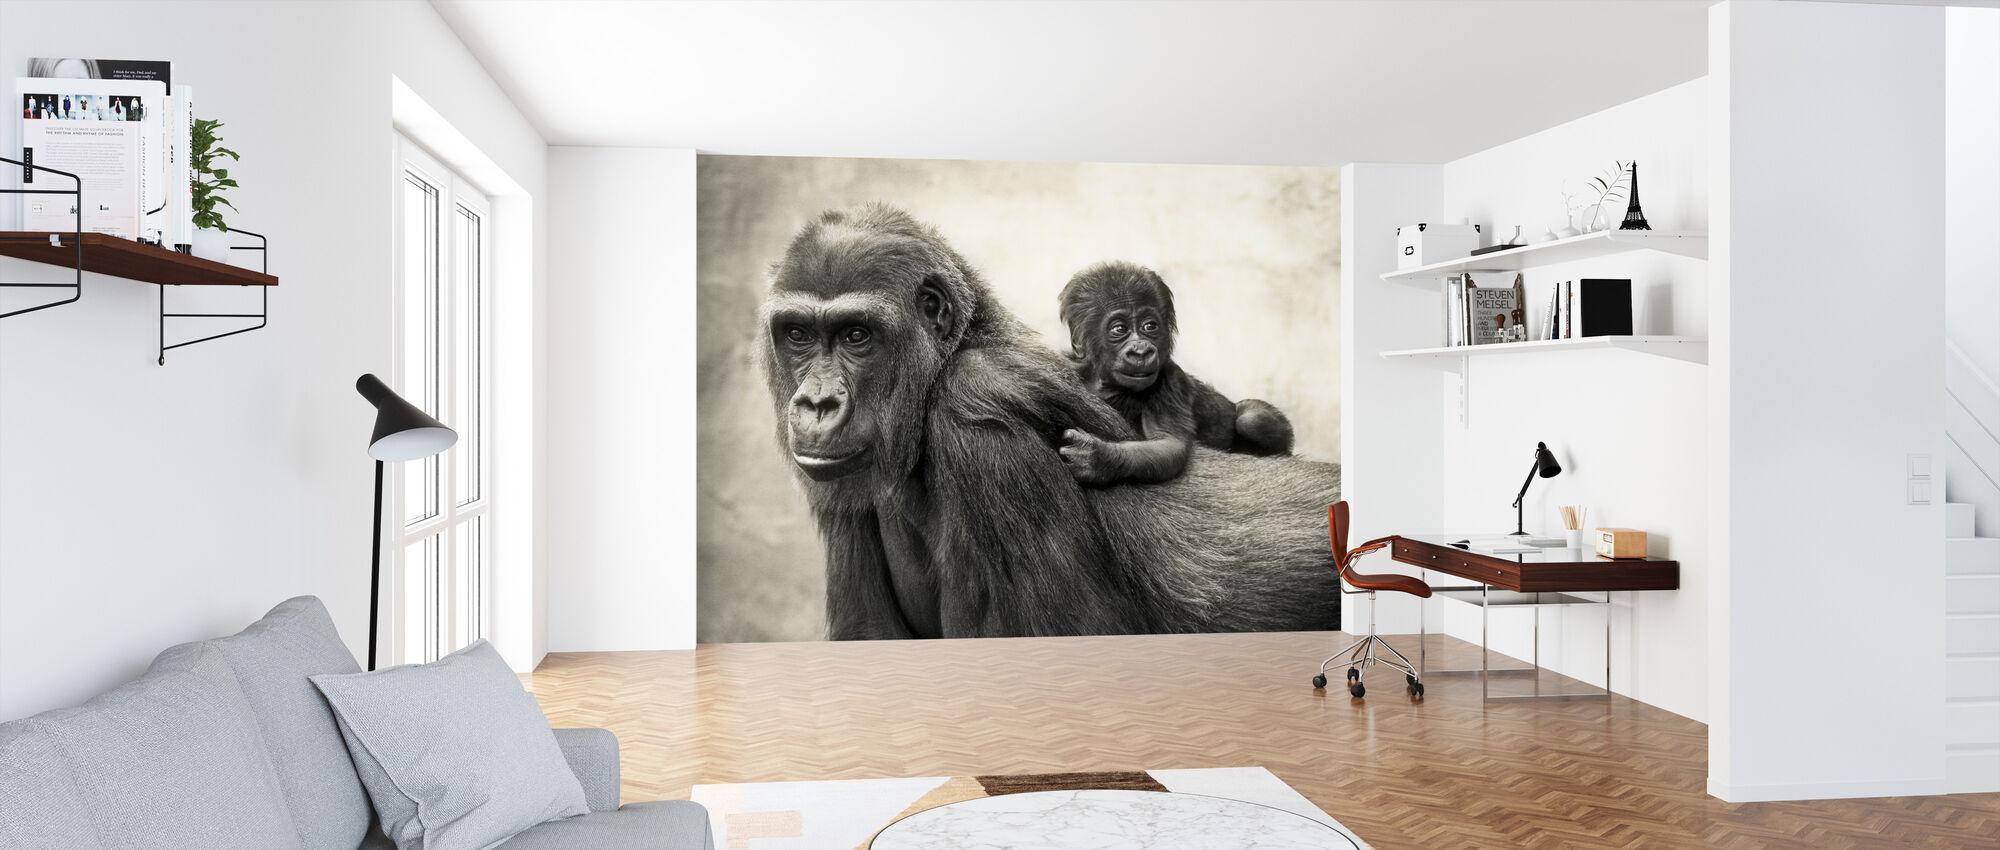 L I F E - Wallpaper - Office